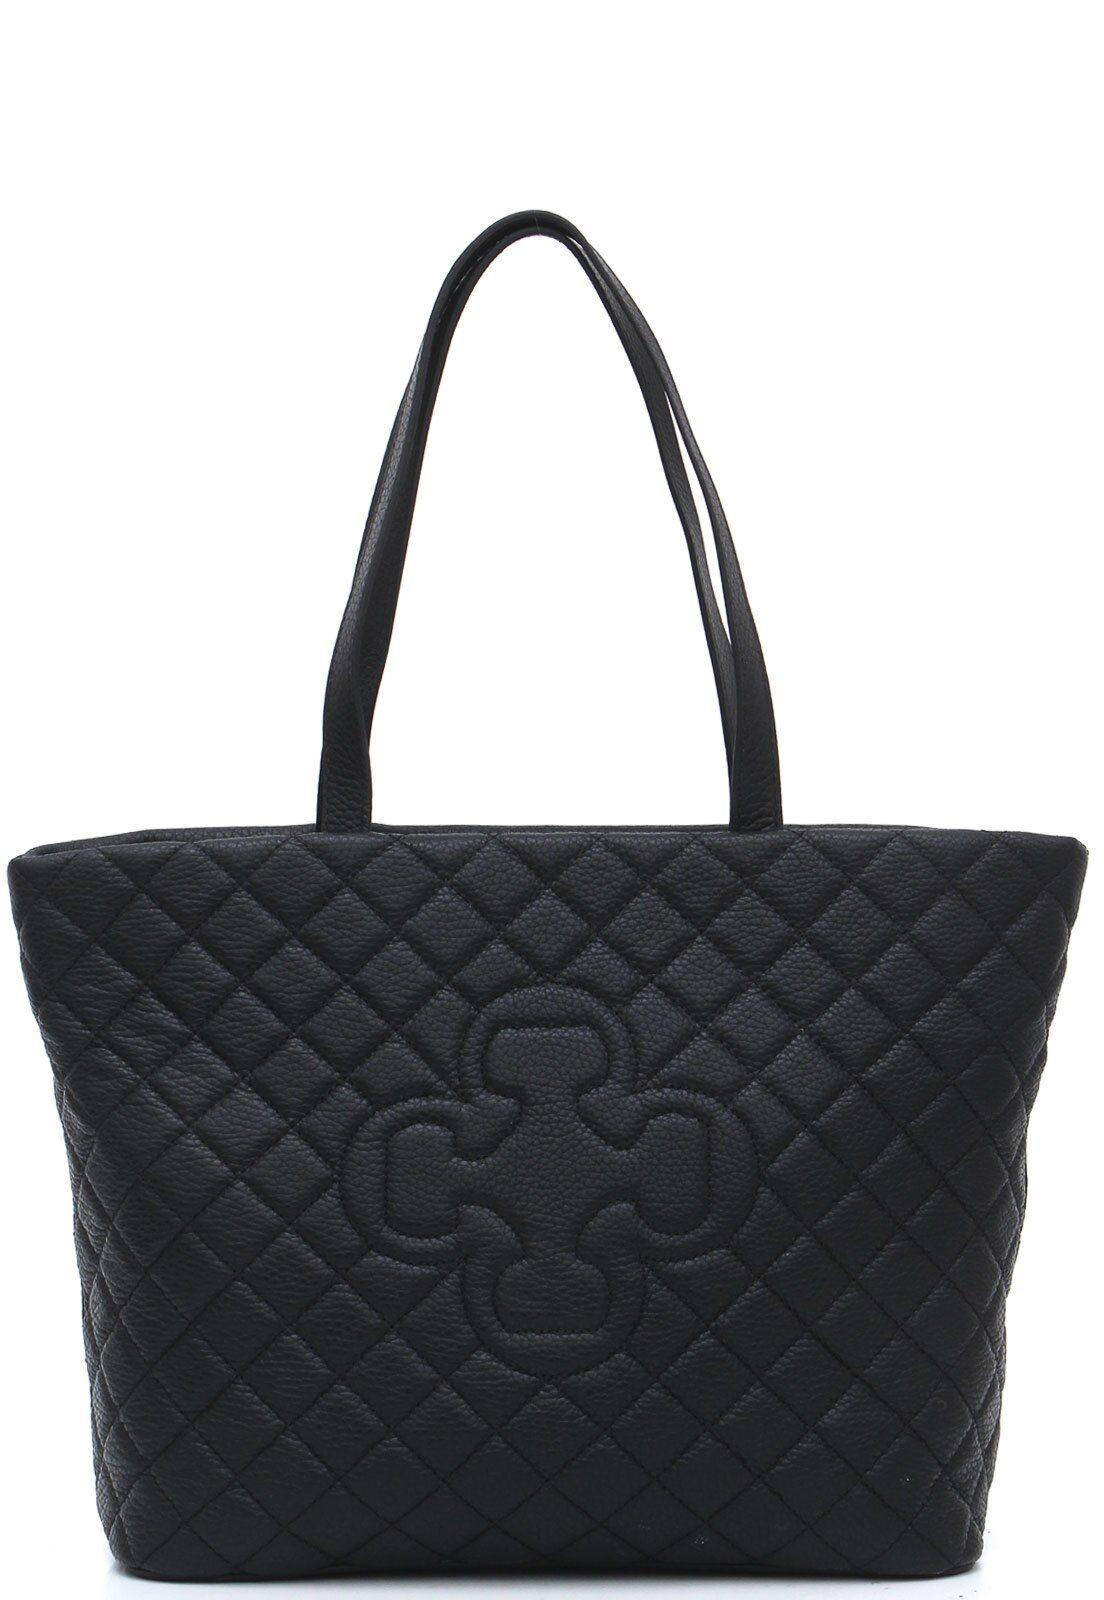 Bolso Capodarte Cuero Negro Matelassê